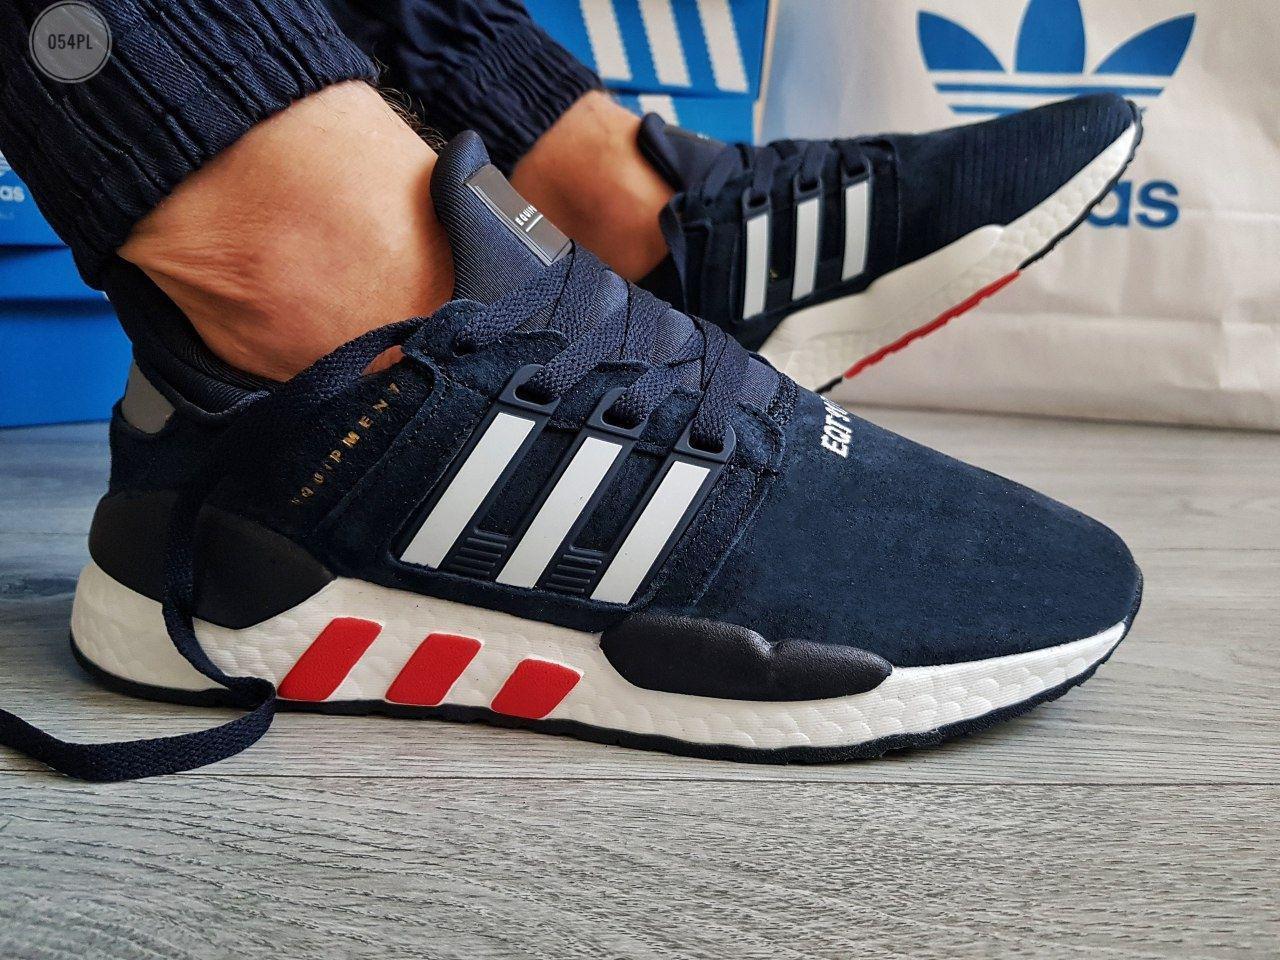 Мужские кроссовки Adidas Equipment (р. 41 43 44 45) синие